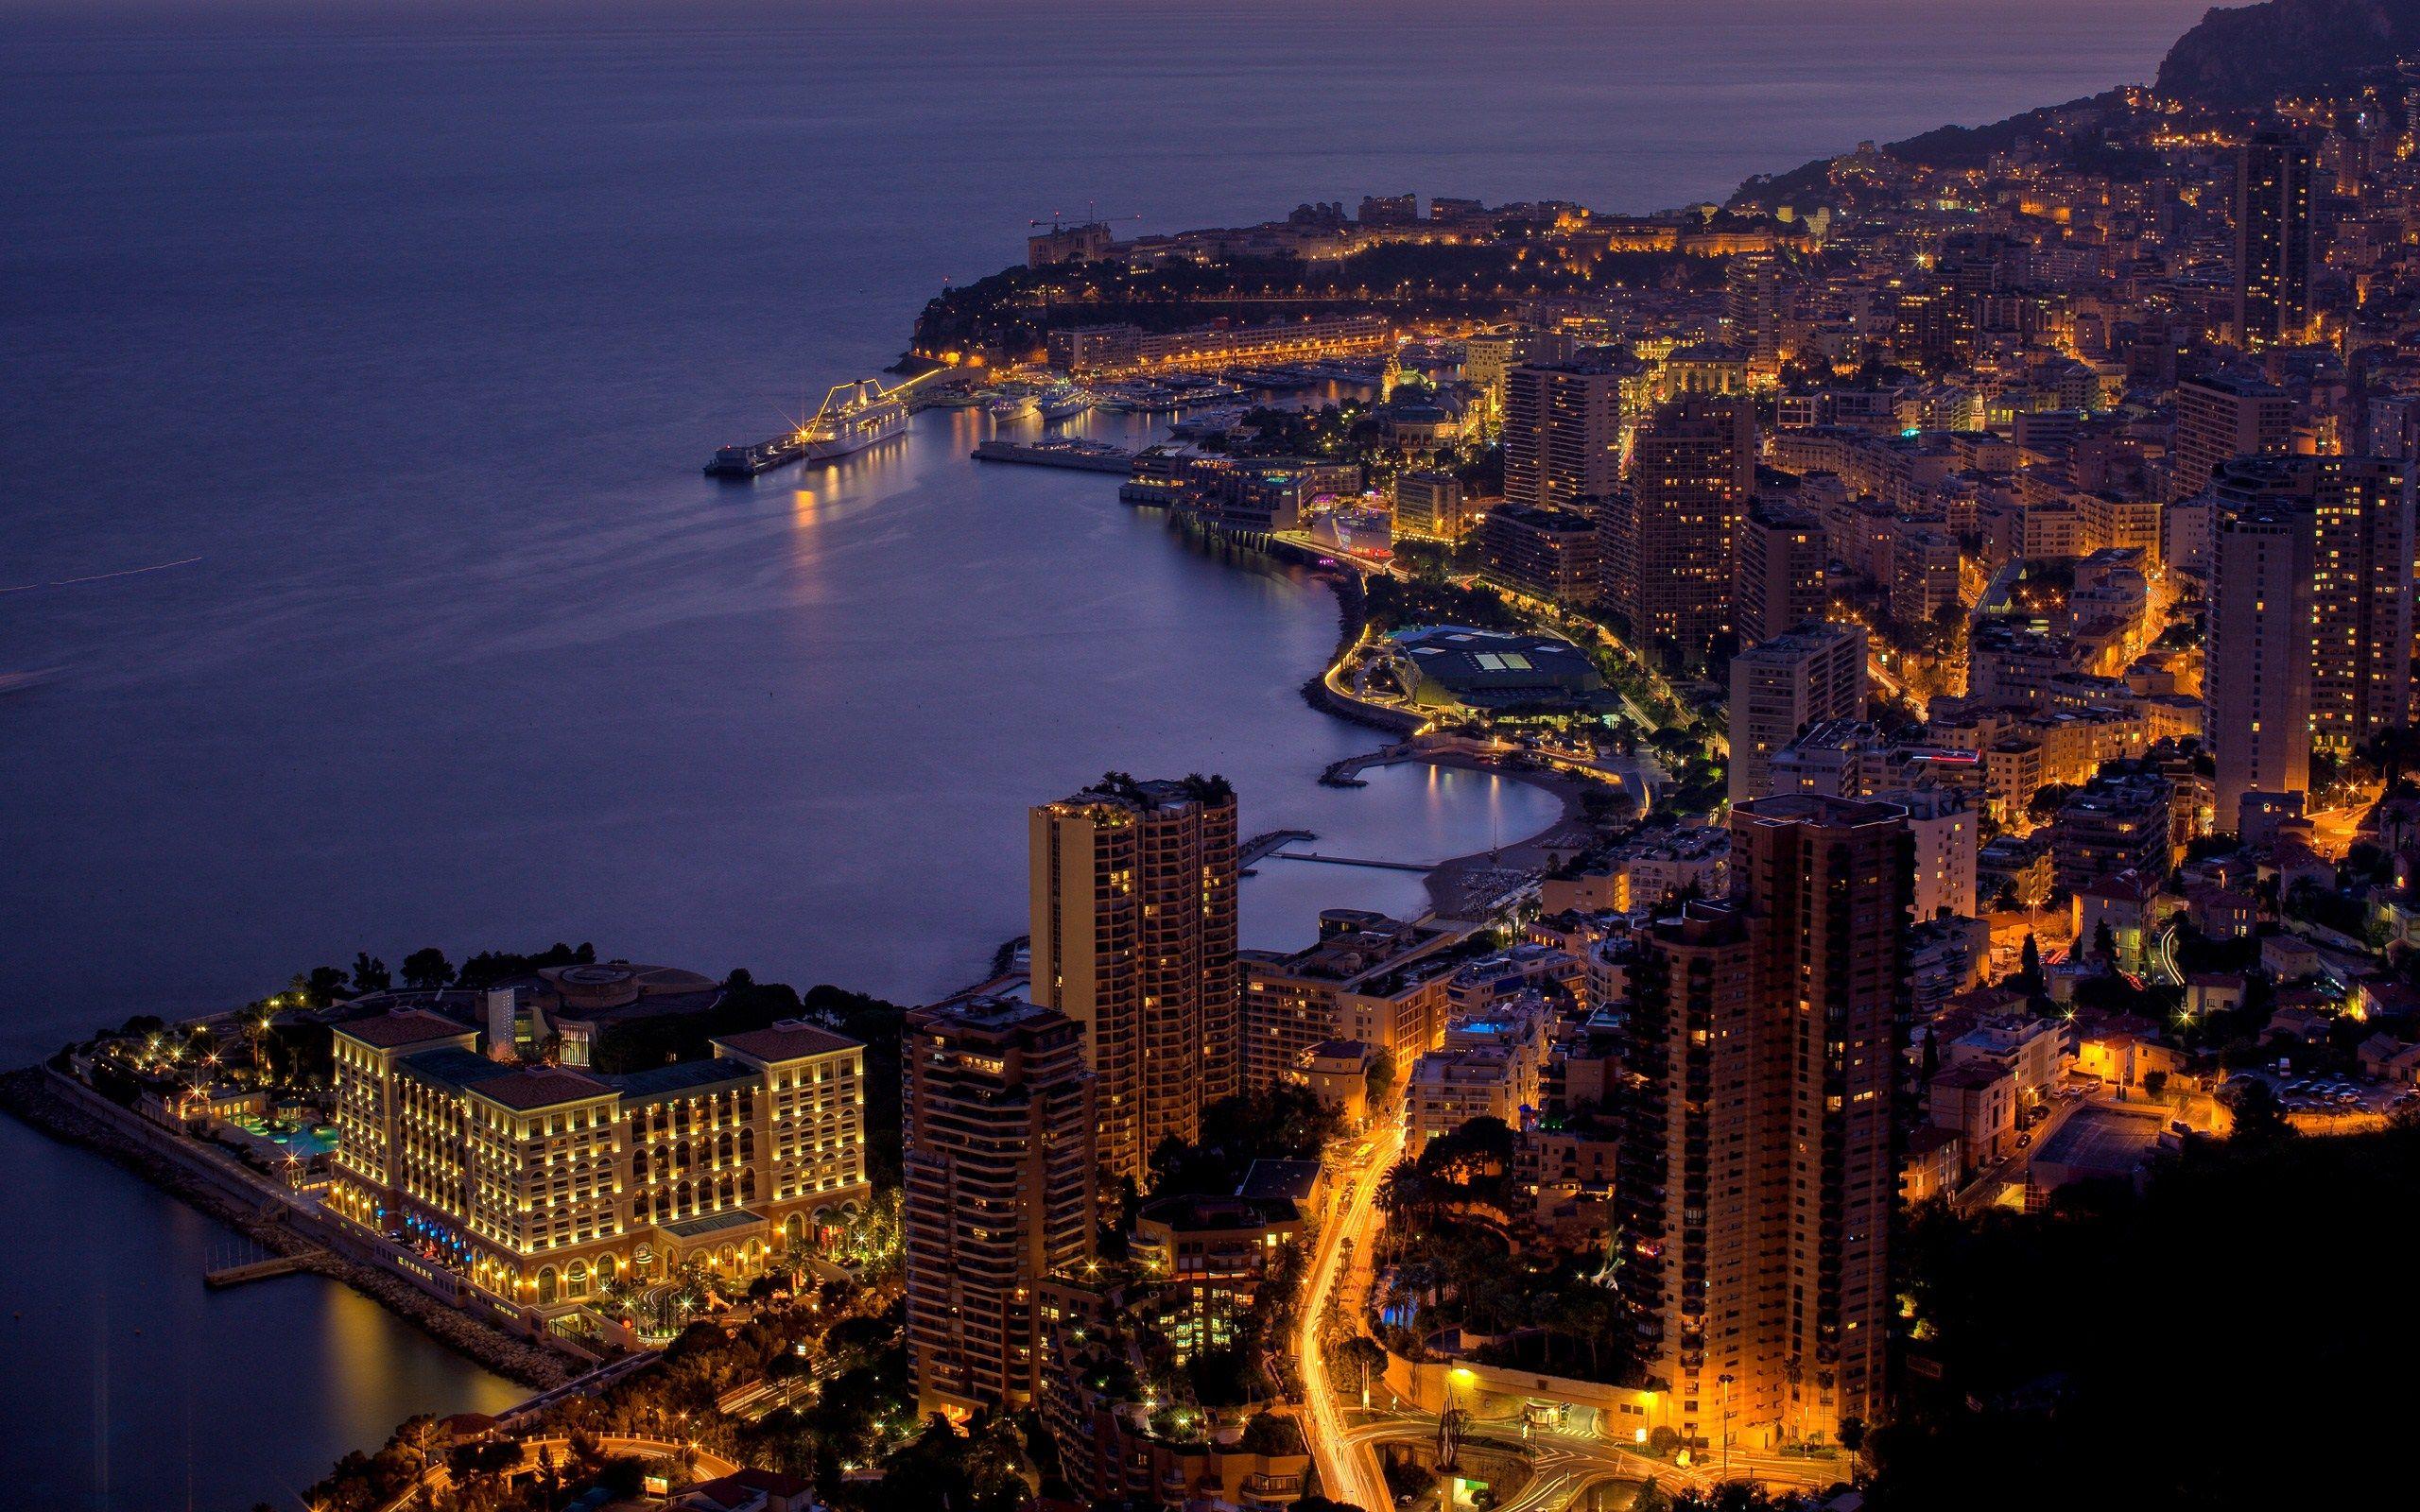 Monaco By Night Google Zoeken Monaco Wallpaper Places To See Monaco Amazing monte carlo wallpapers